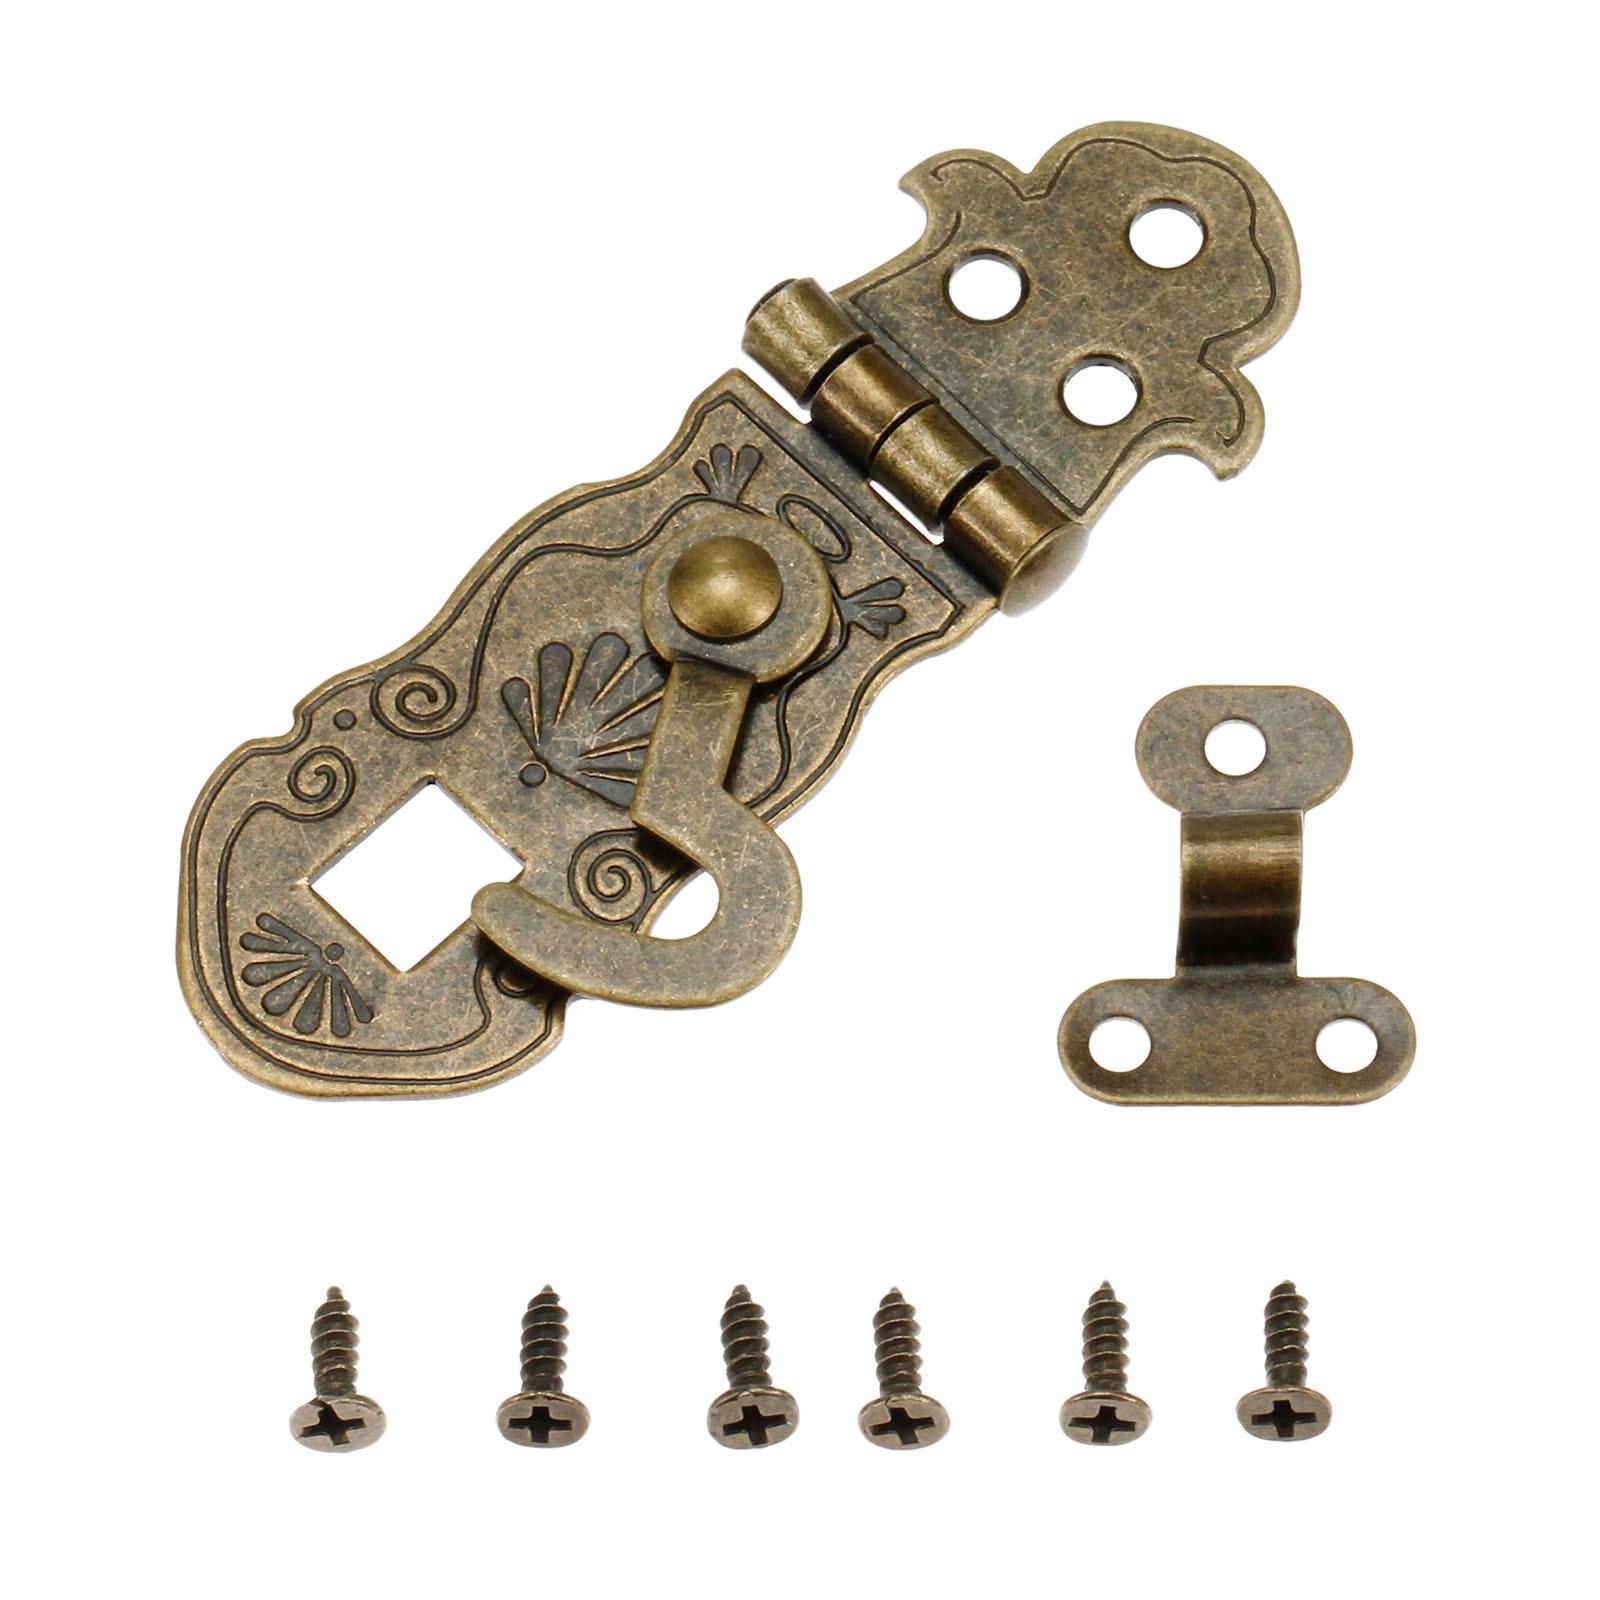 DRELD 1Pc 71*24mm Wooden Box Toggle Lock Antique Bronze Box Buckles Latch Clasp Pattern Carved Flower Book Lock Bronze Tone